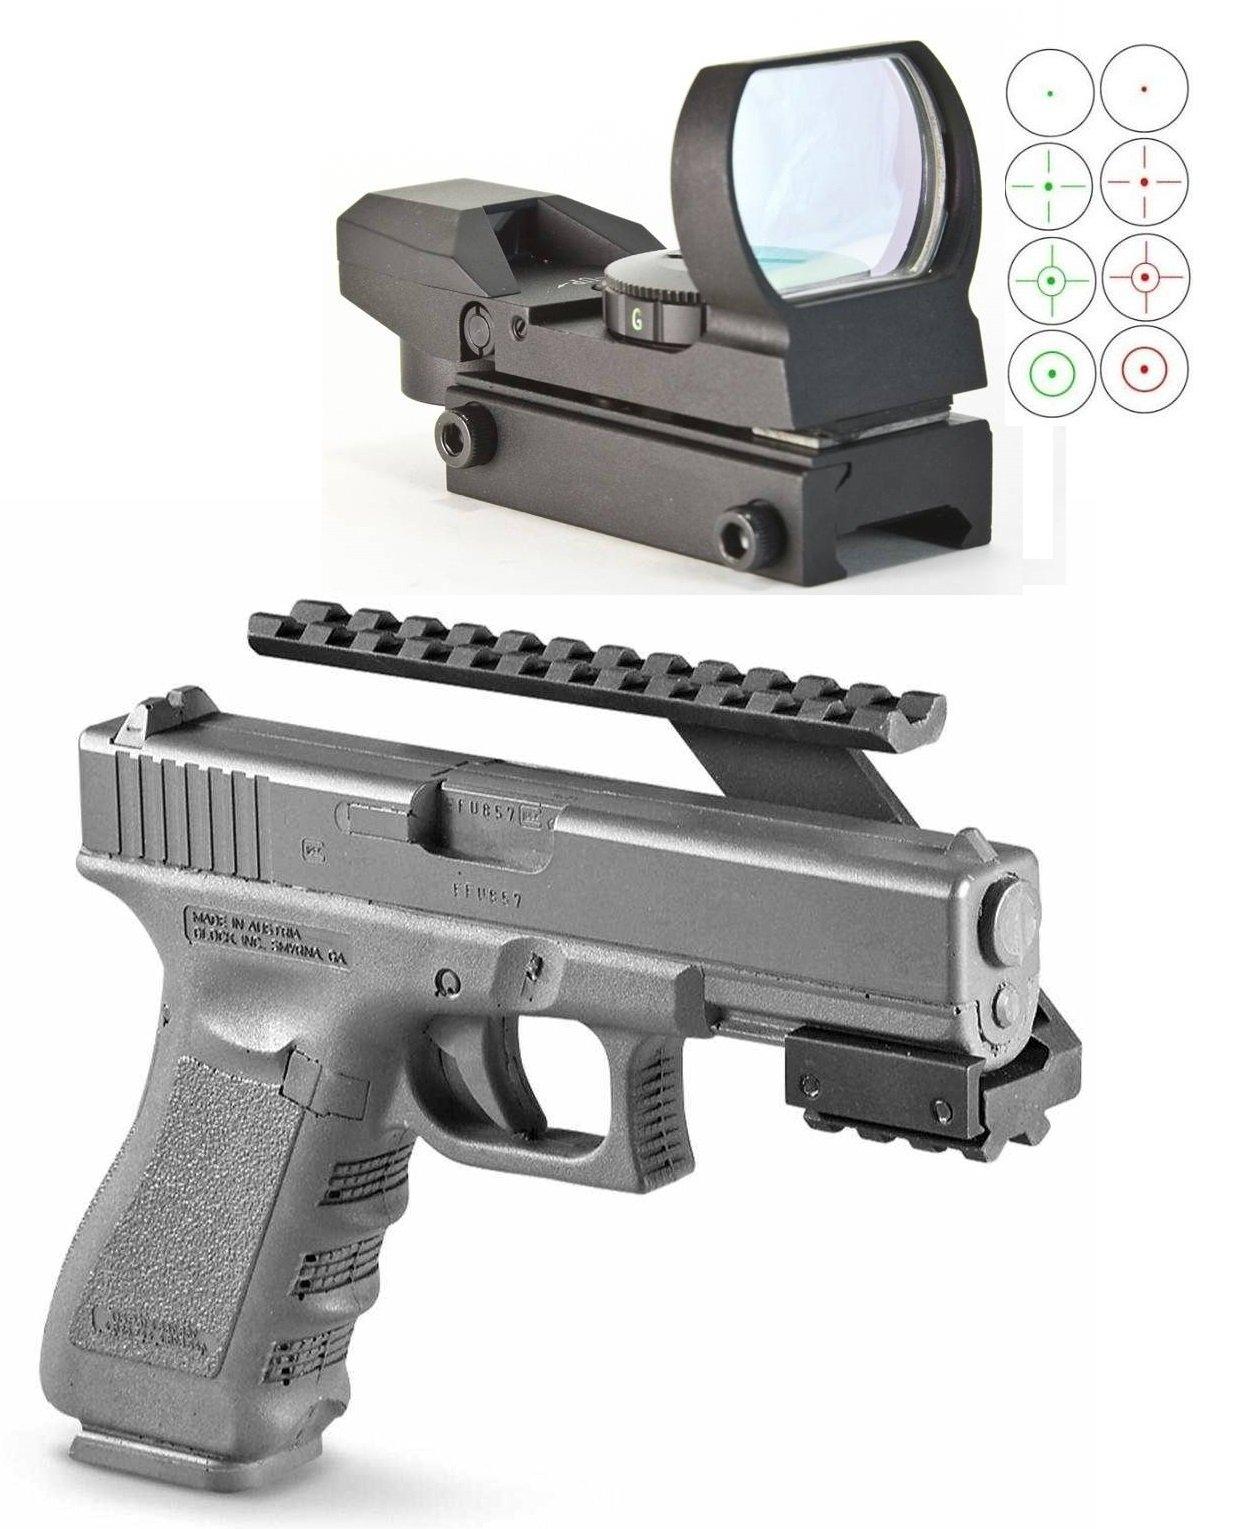 Ultimate Arms Gear Pistol Handgun Scope Mount Fits Sig Sauer 226 229 220 P250 Sig Pro Pistols + ''CQB'' Red-Green Reticle Dot Open Reflex Sight/Scope